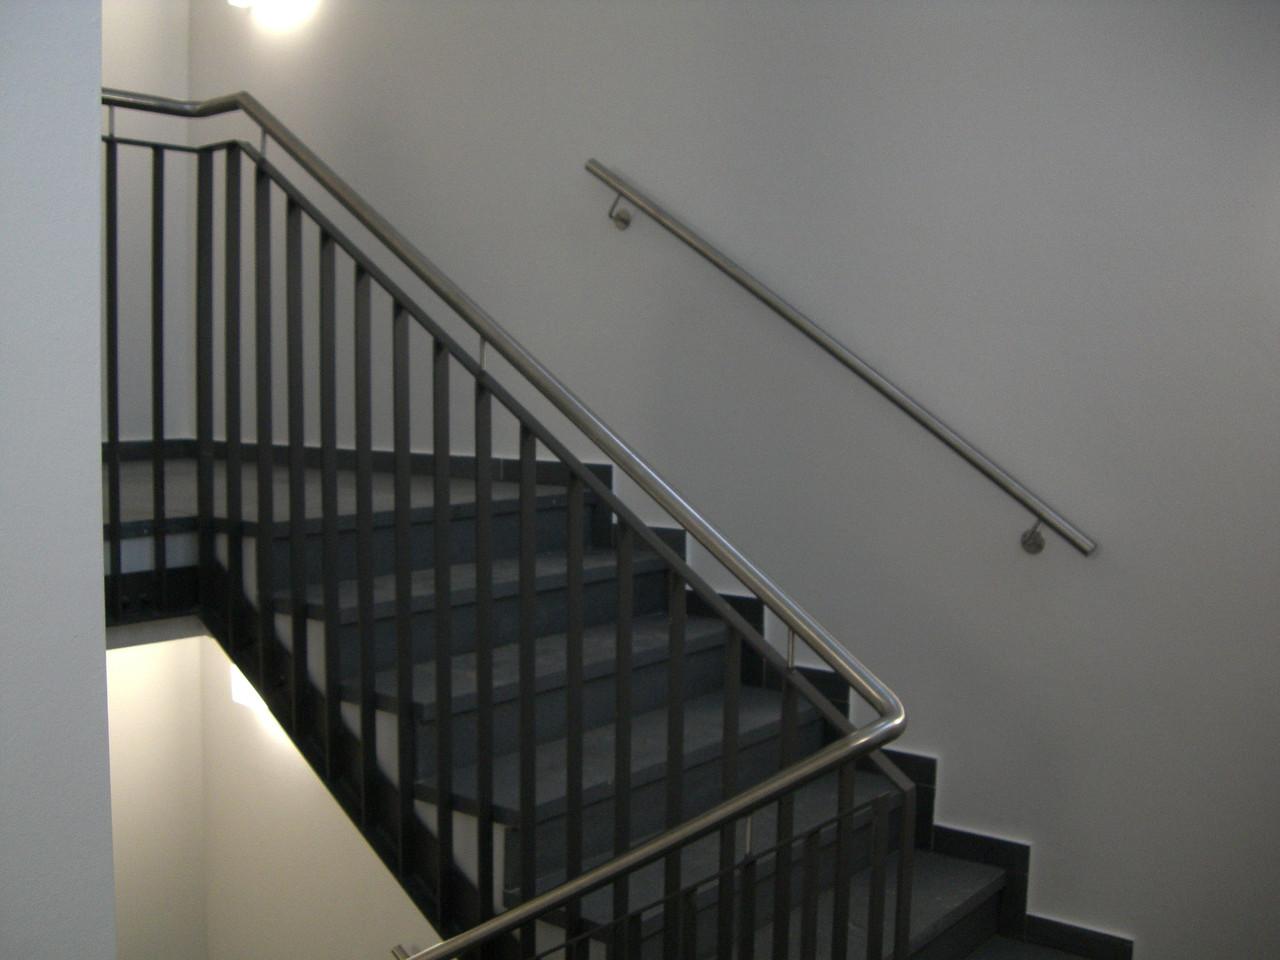 Geländer lackiert Edelstahl Handlauf